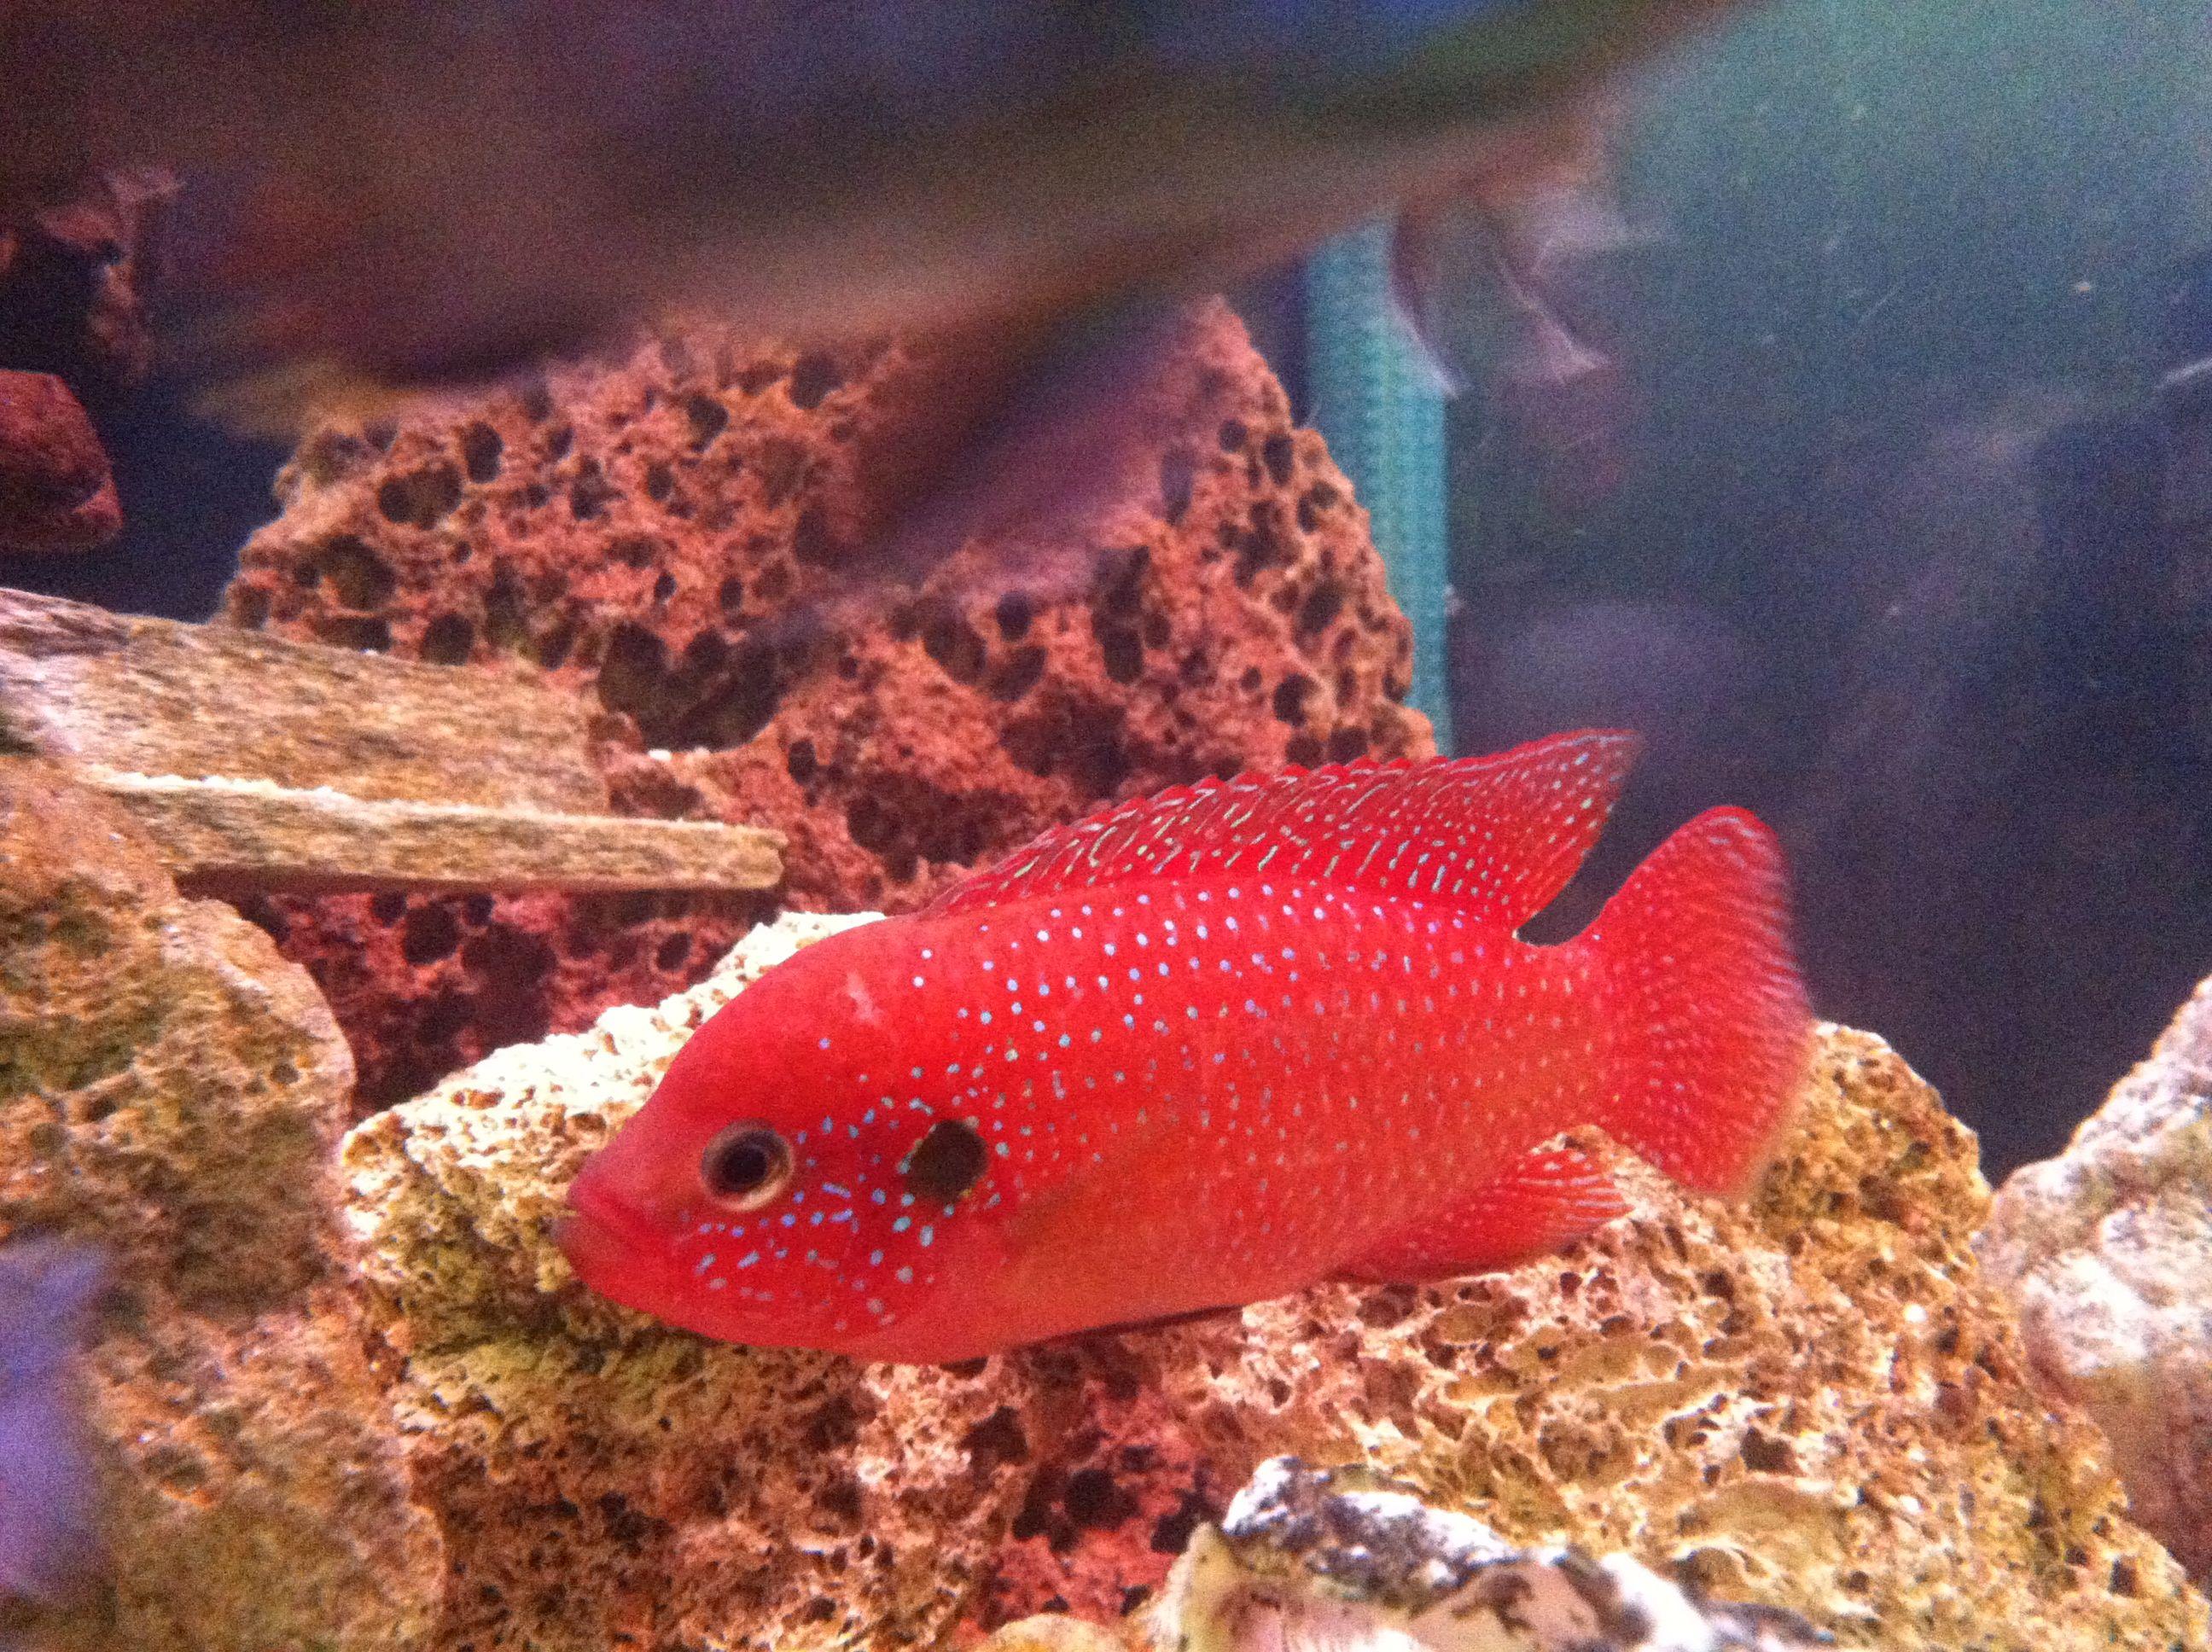 Freshwater jewel fish - Cichlid Jewel Fish